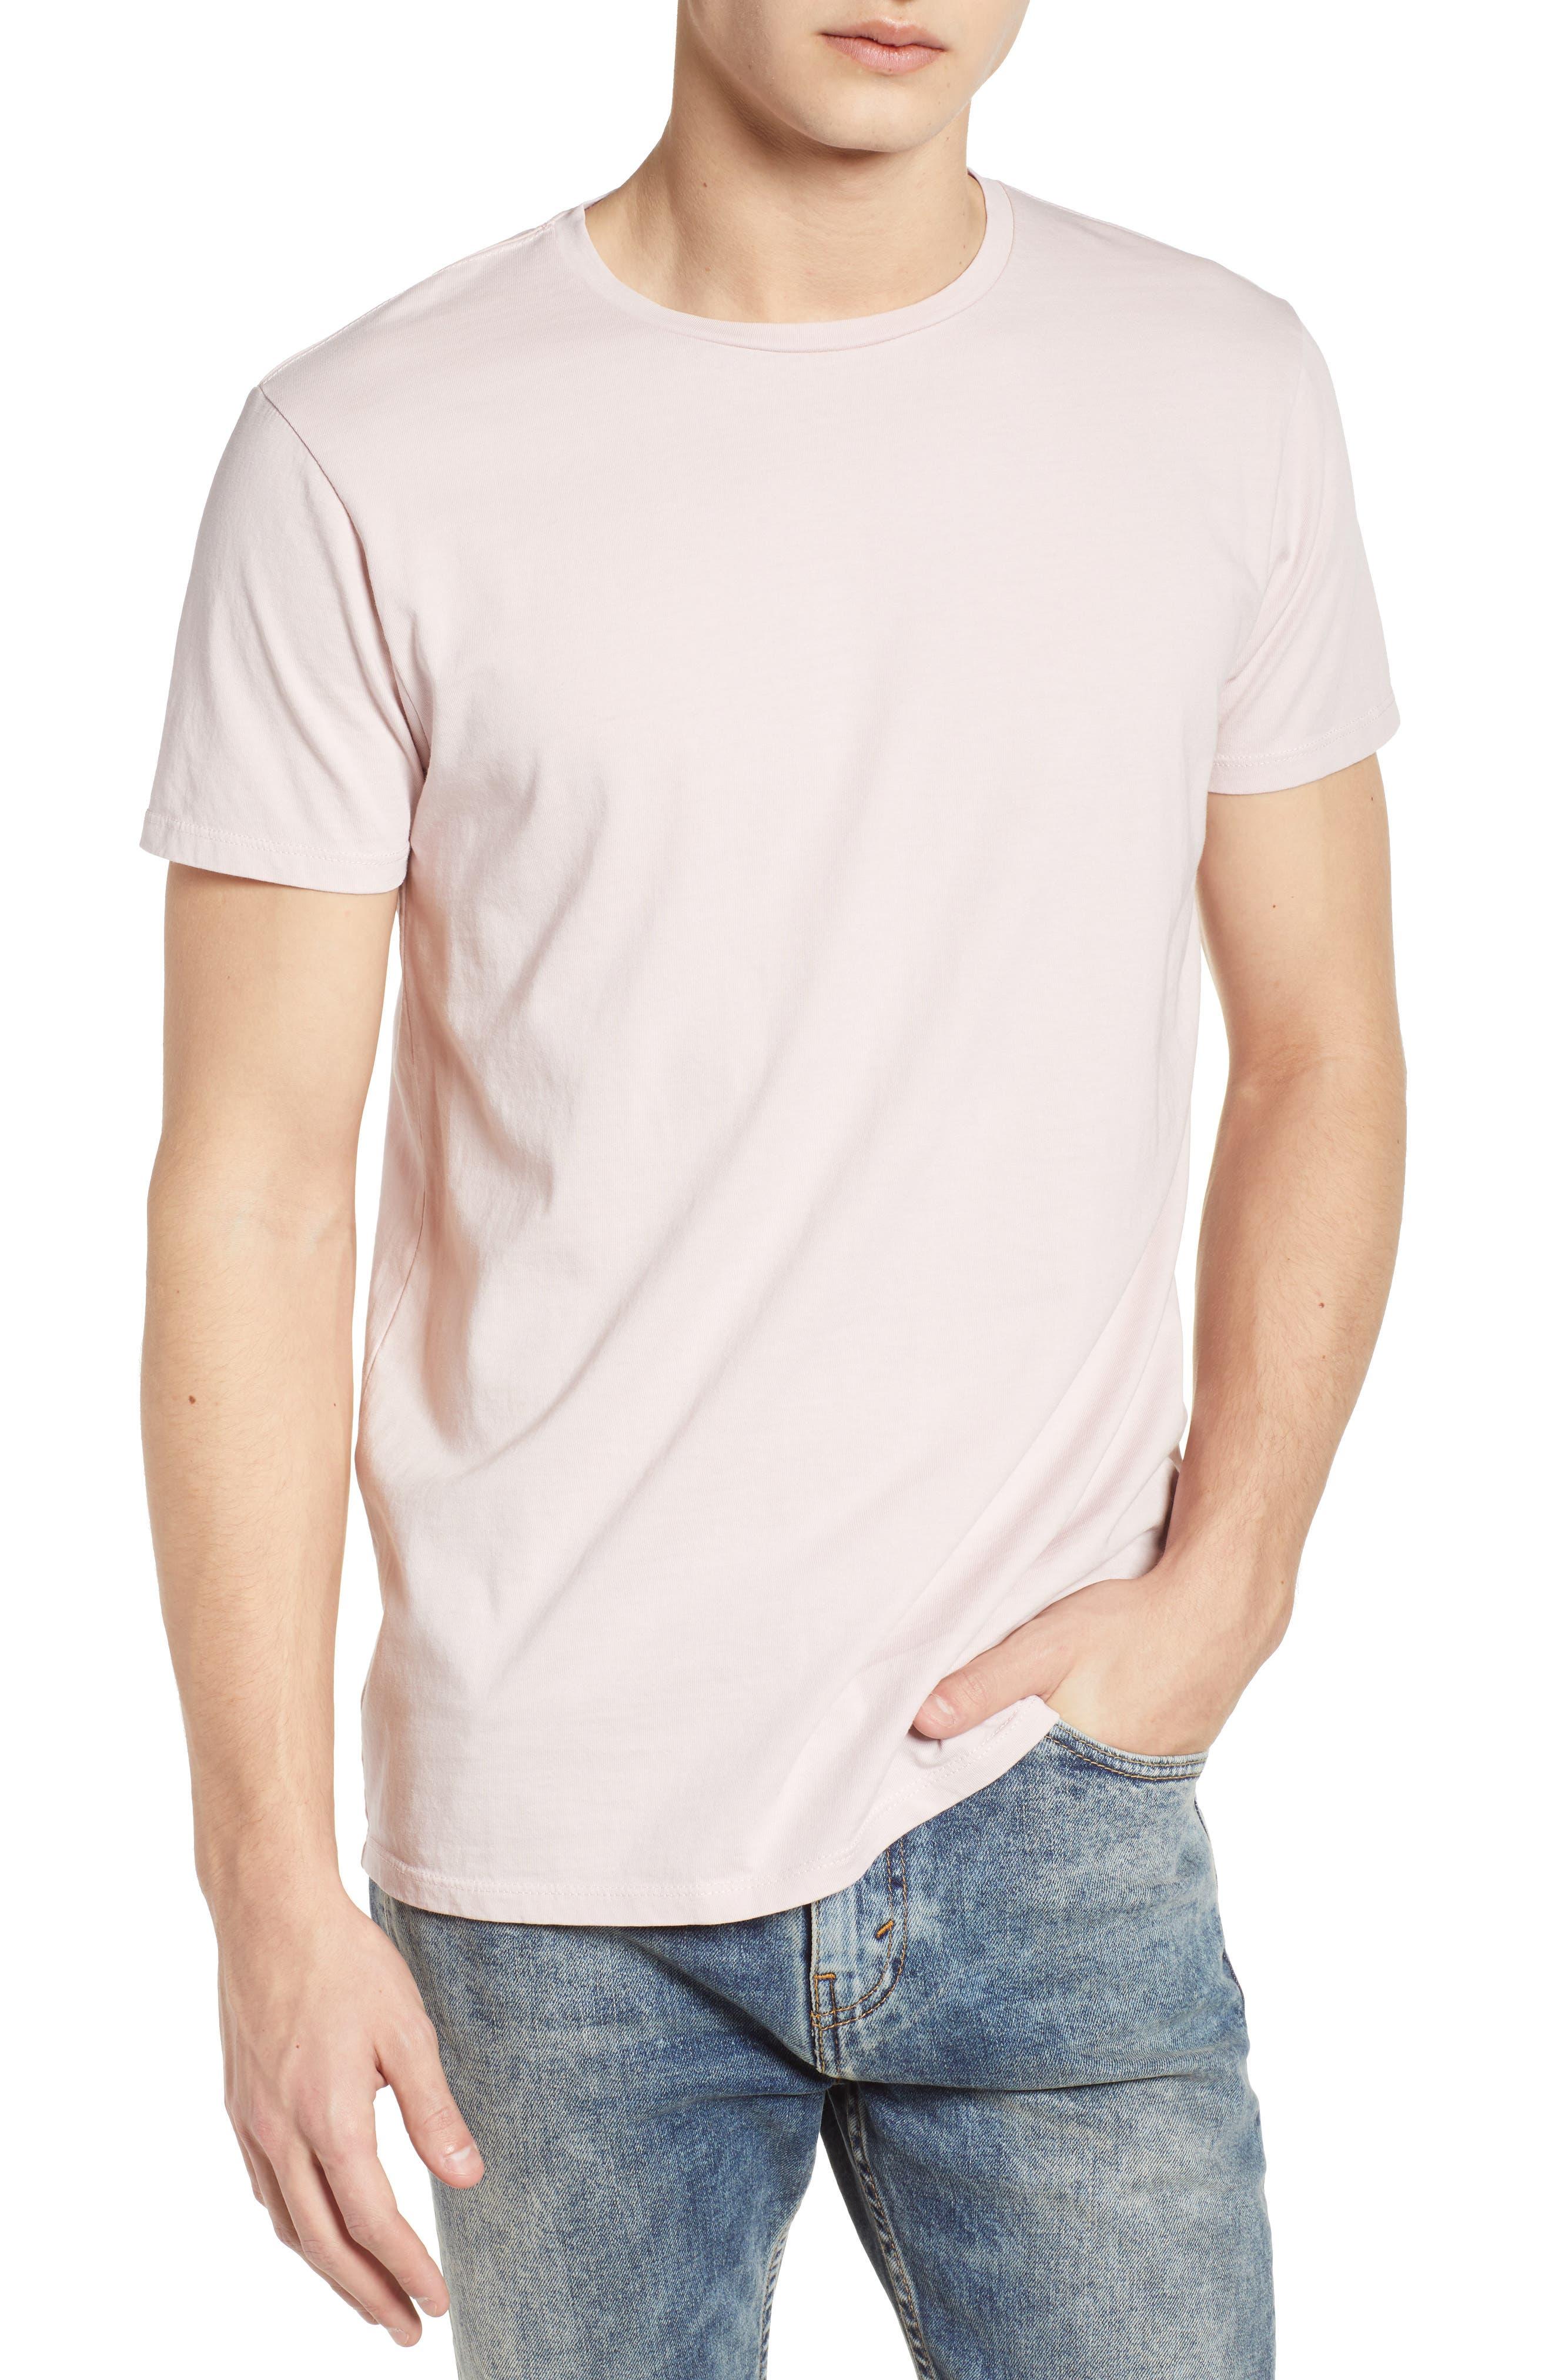 Main Image - Scotch & Soda Classic Crewneck T-Shirt